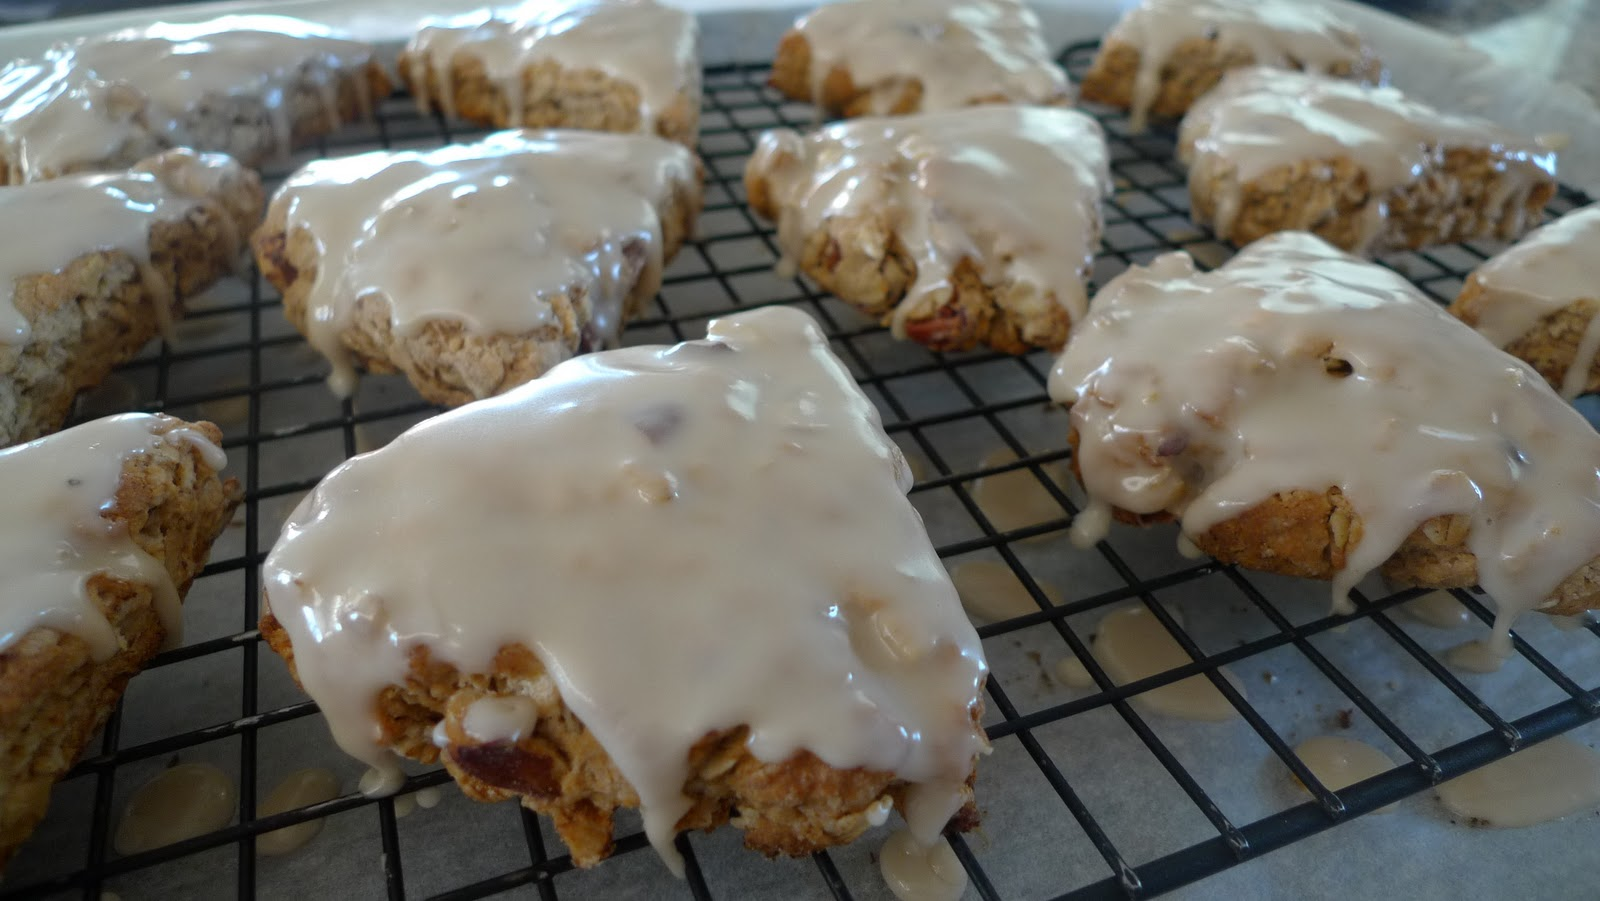 Mingling of Tastes: Maple Oat Nut Scones